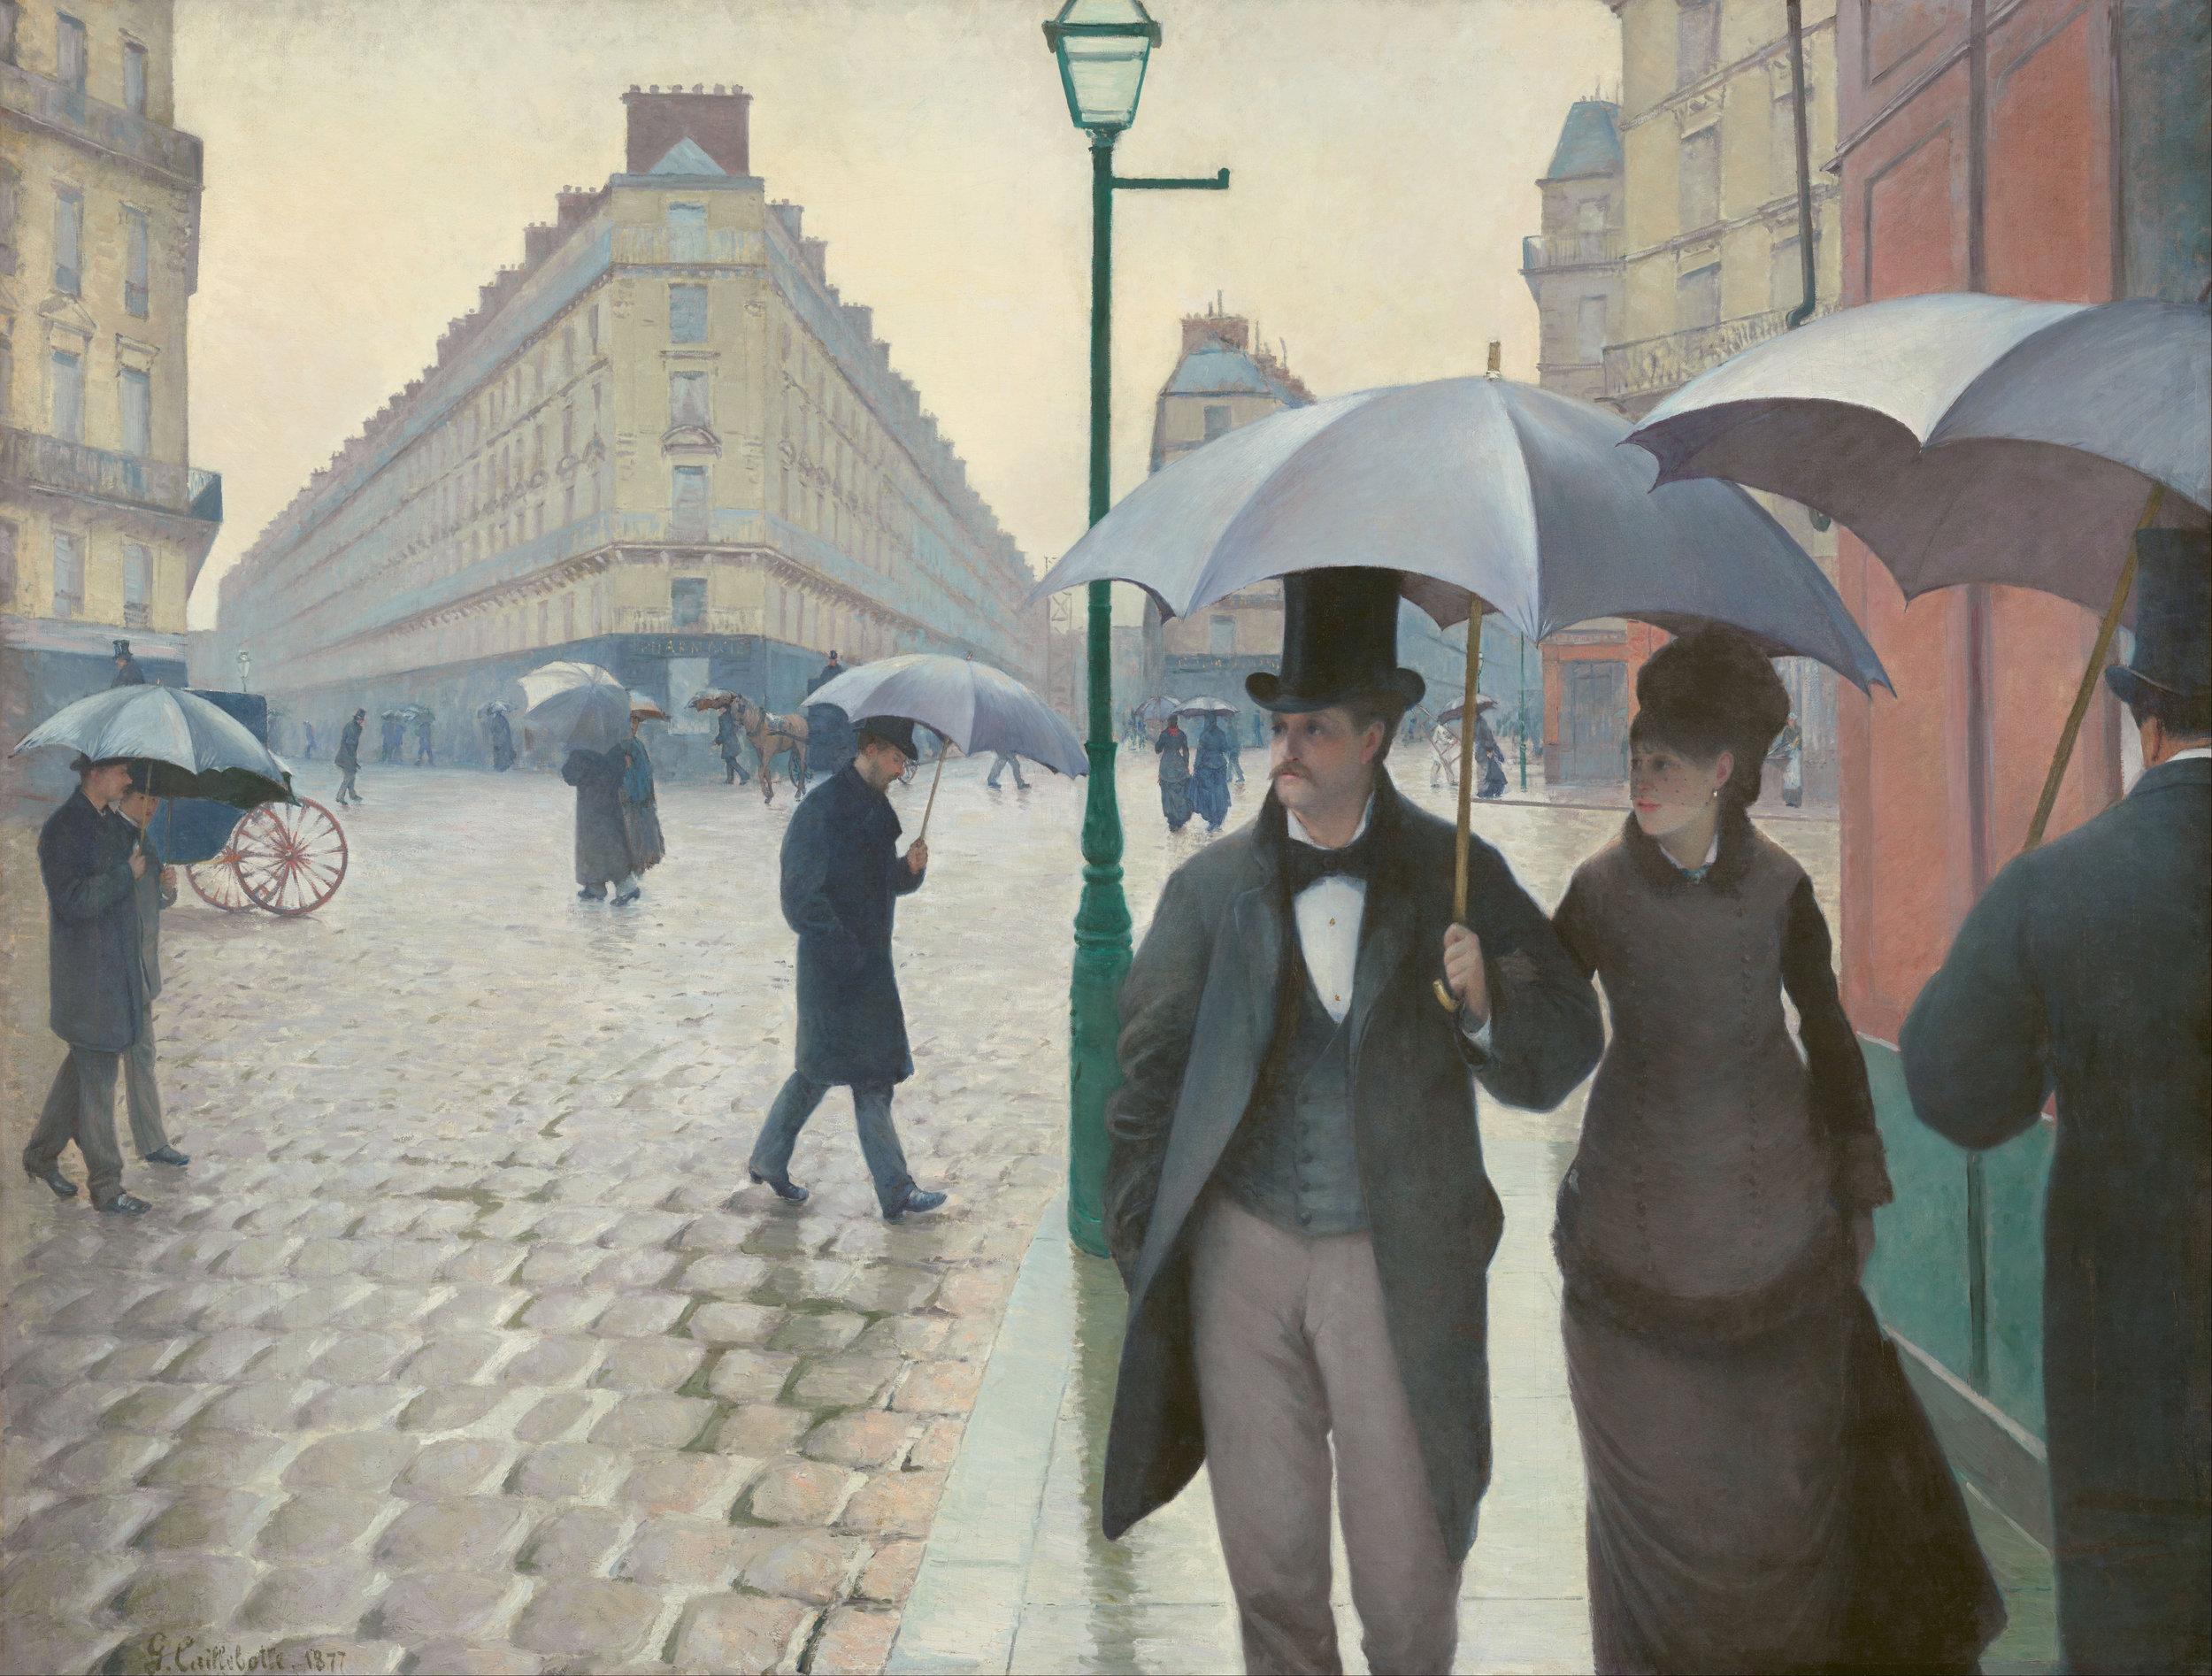 Gustave_Caillebotte_-_Paris_Street;_Rainy_Day_-_Google_Art_Project.jpg